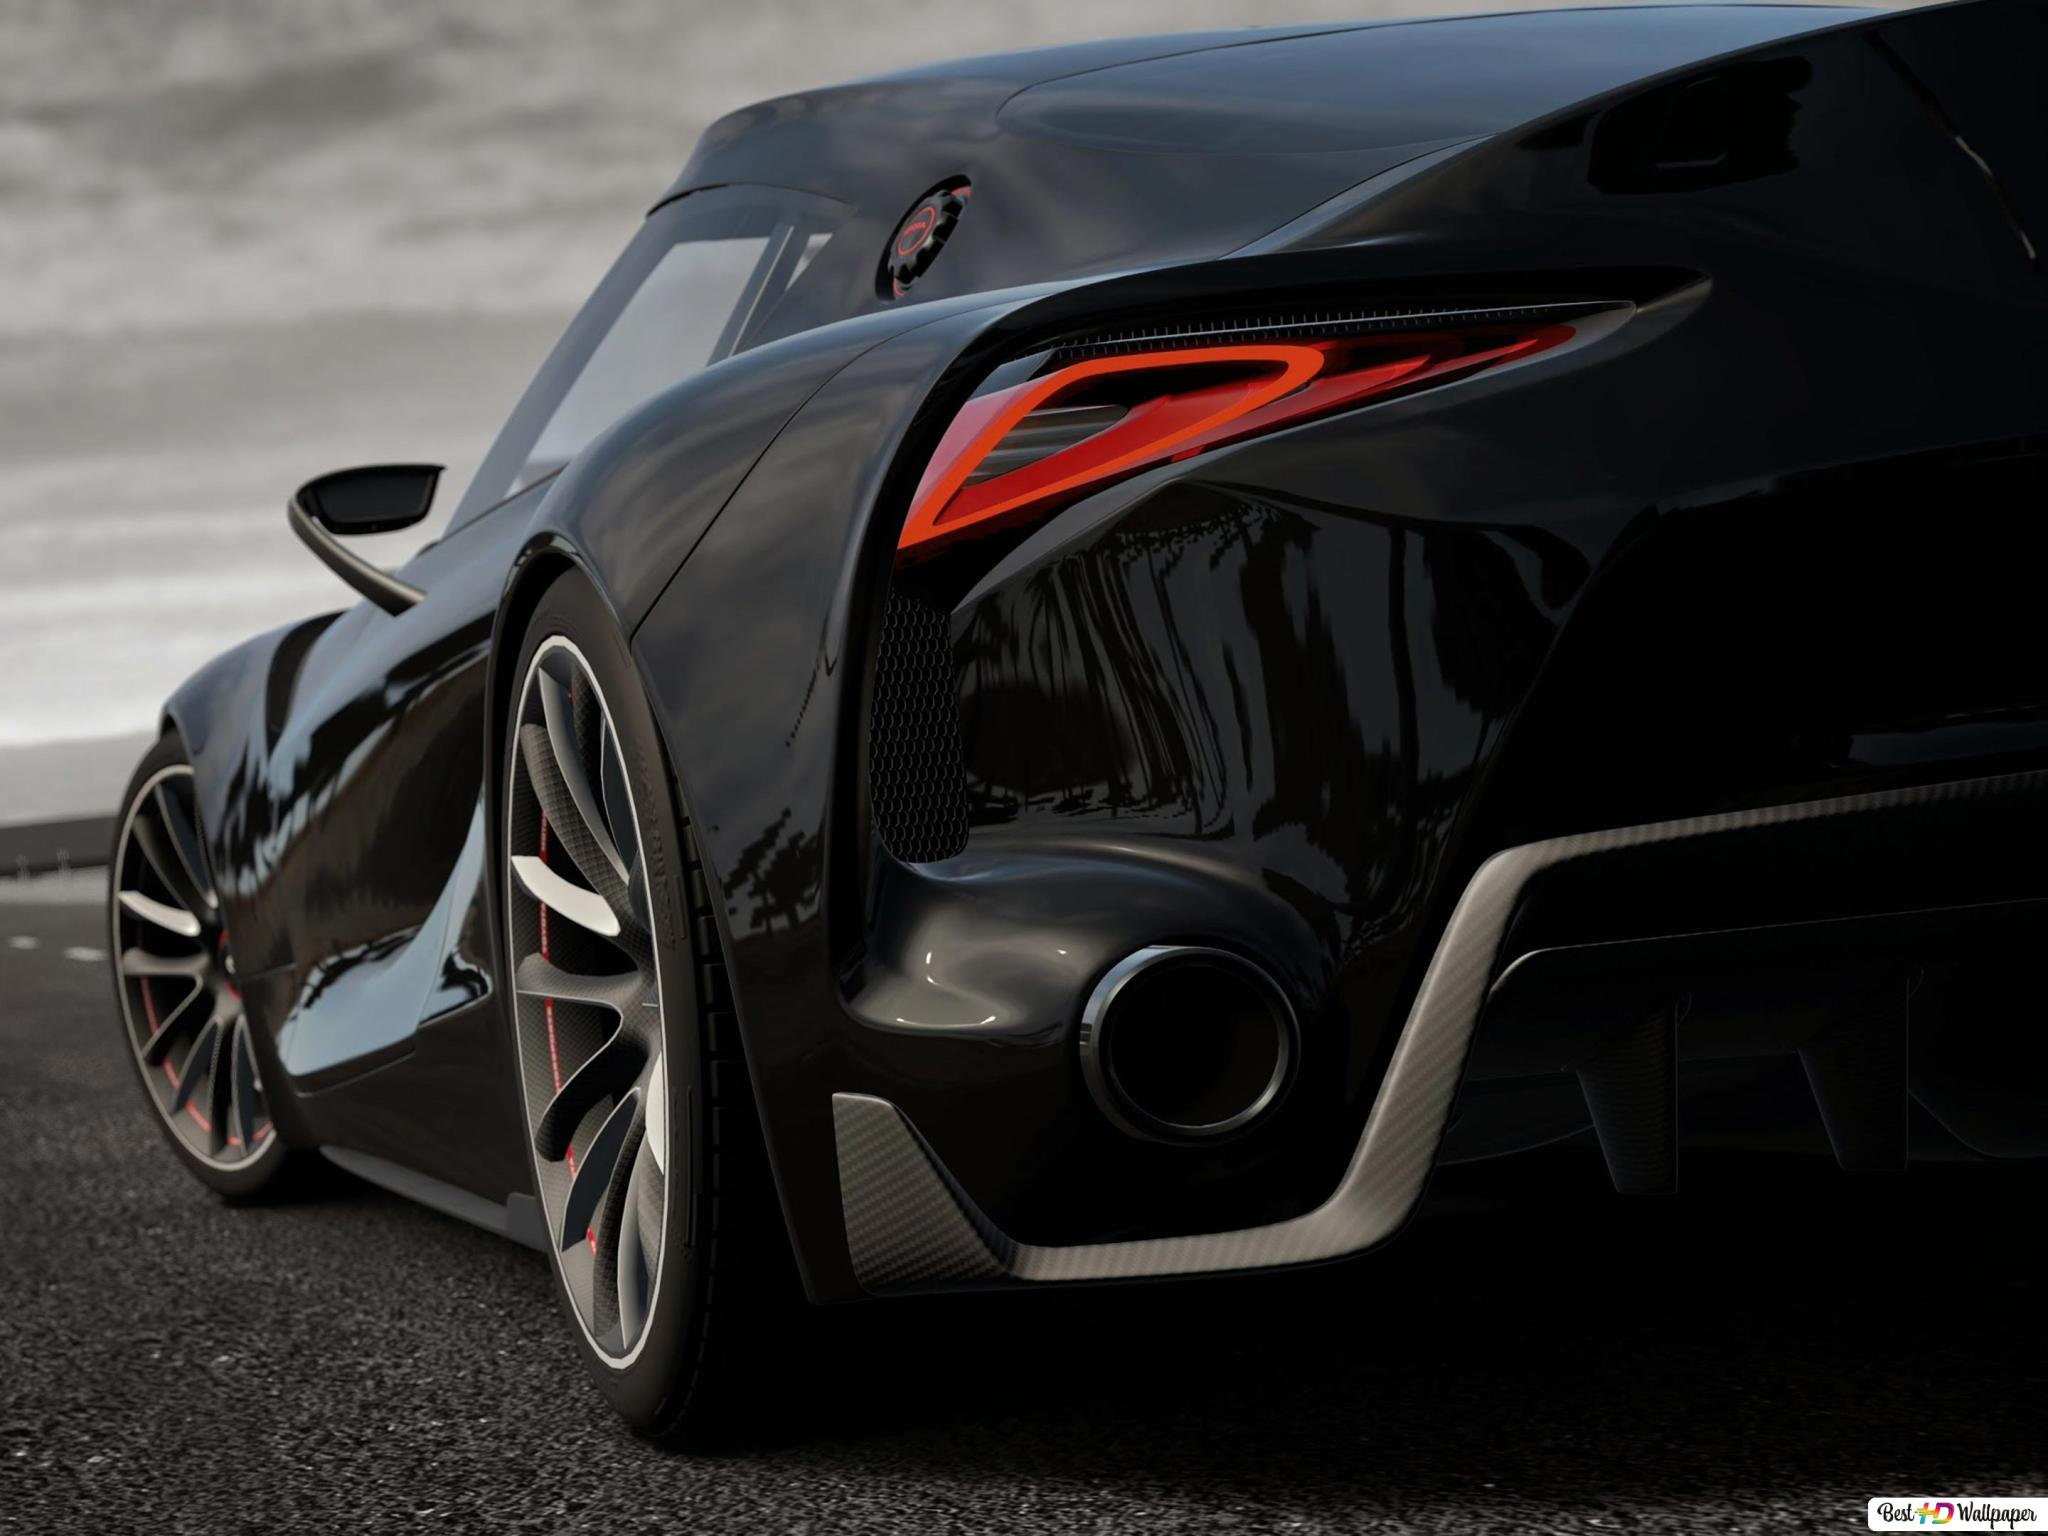 Gran Turismo Vi Black Luxurious Car Hd Wallpaper Download